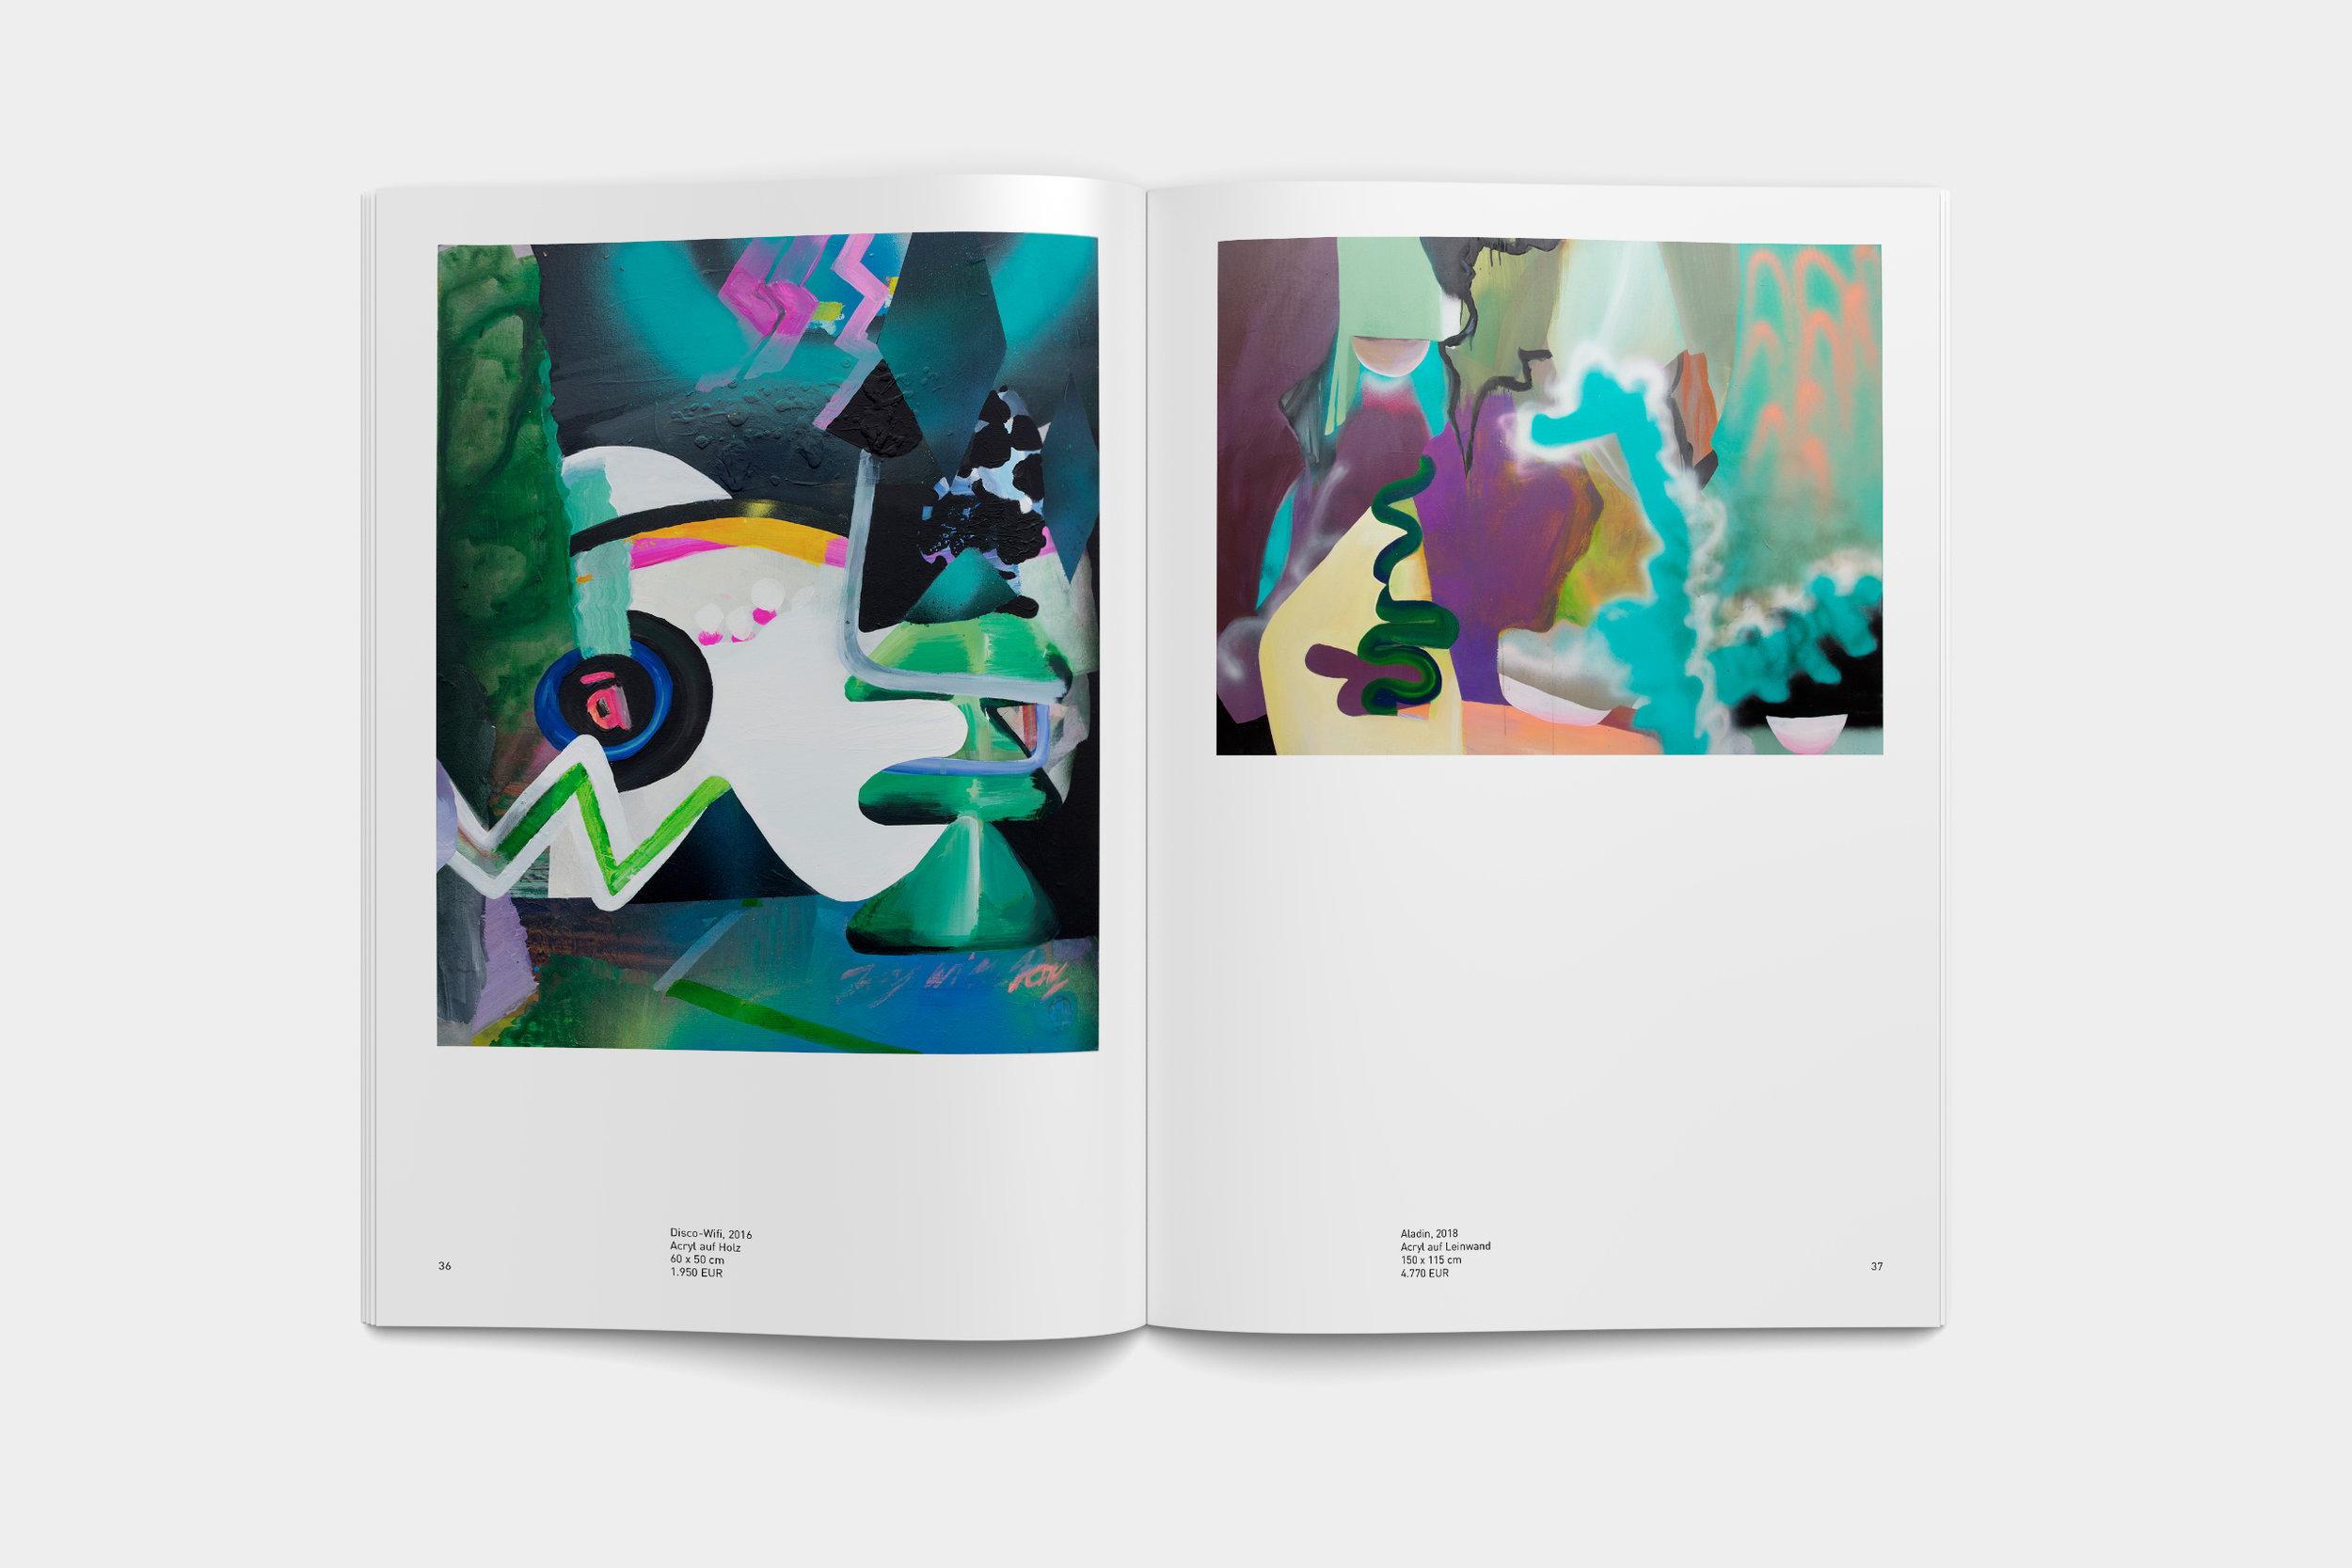 blank_rpr-art_booklet_ci_5.jpg